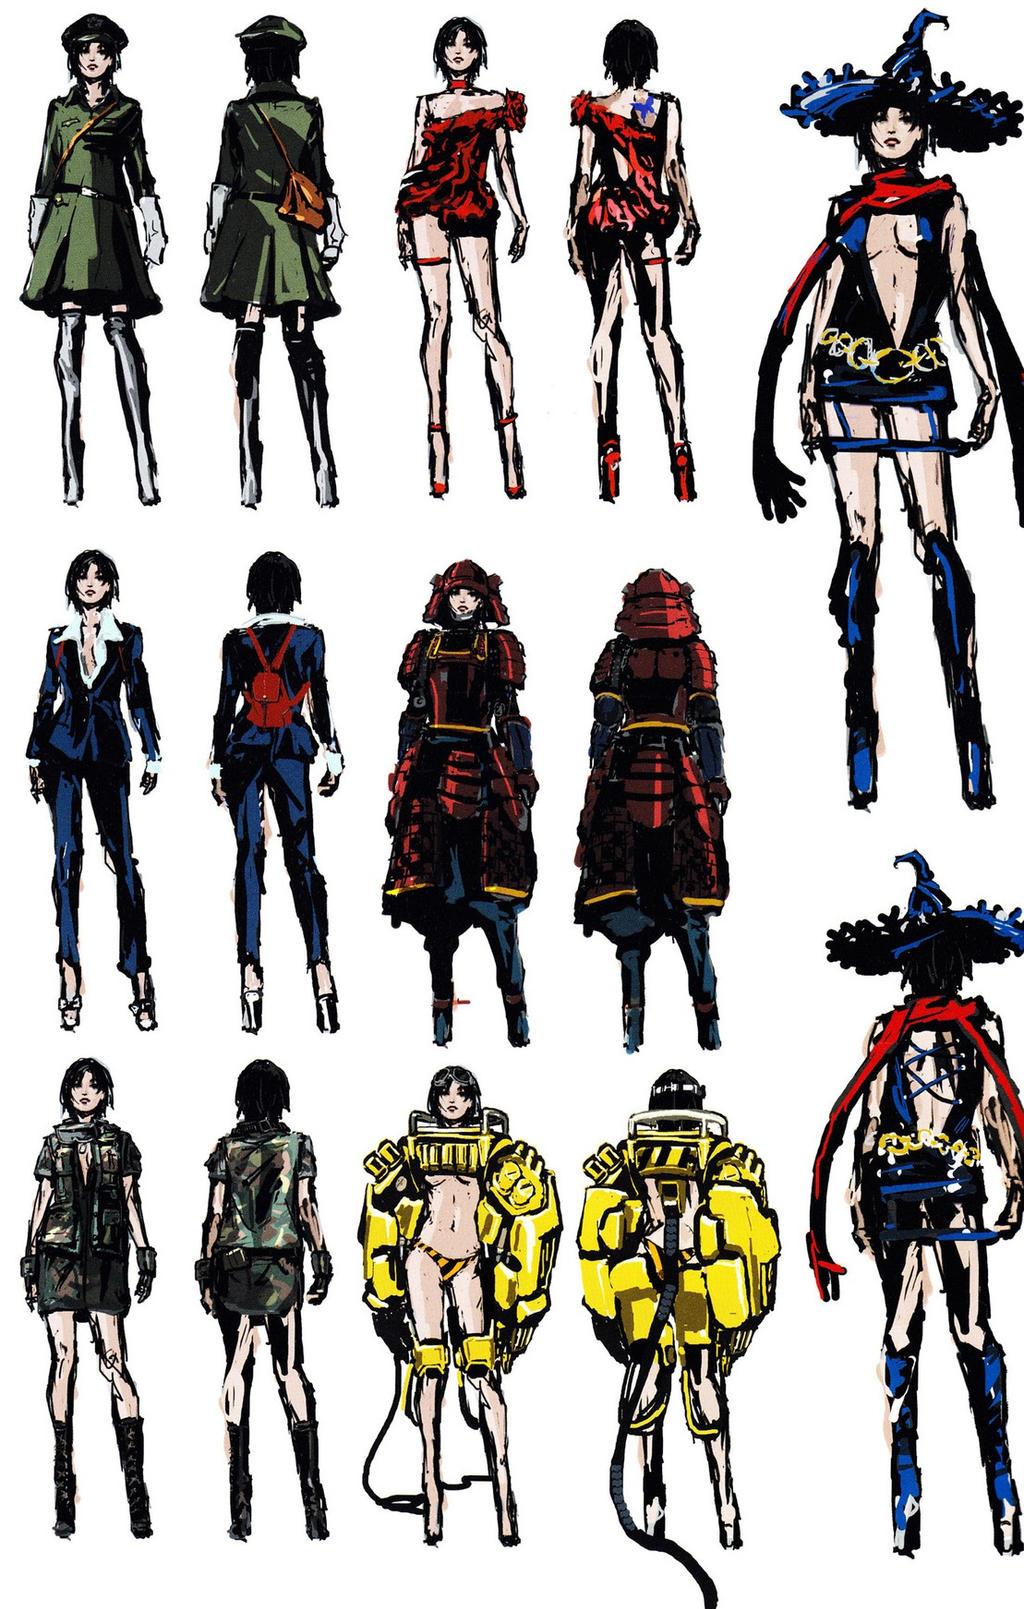 Resident evil wiki,residentevil,ustanak/gallery,jake muller,ustanak,alyssa ashcroft/gallery,barry burton/gallery